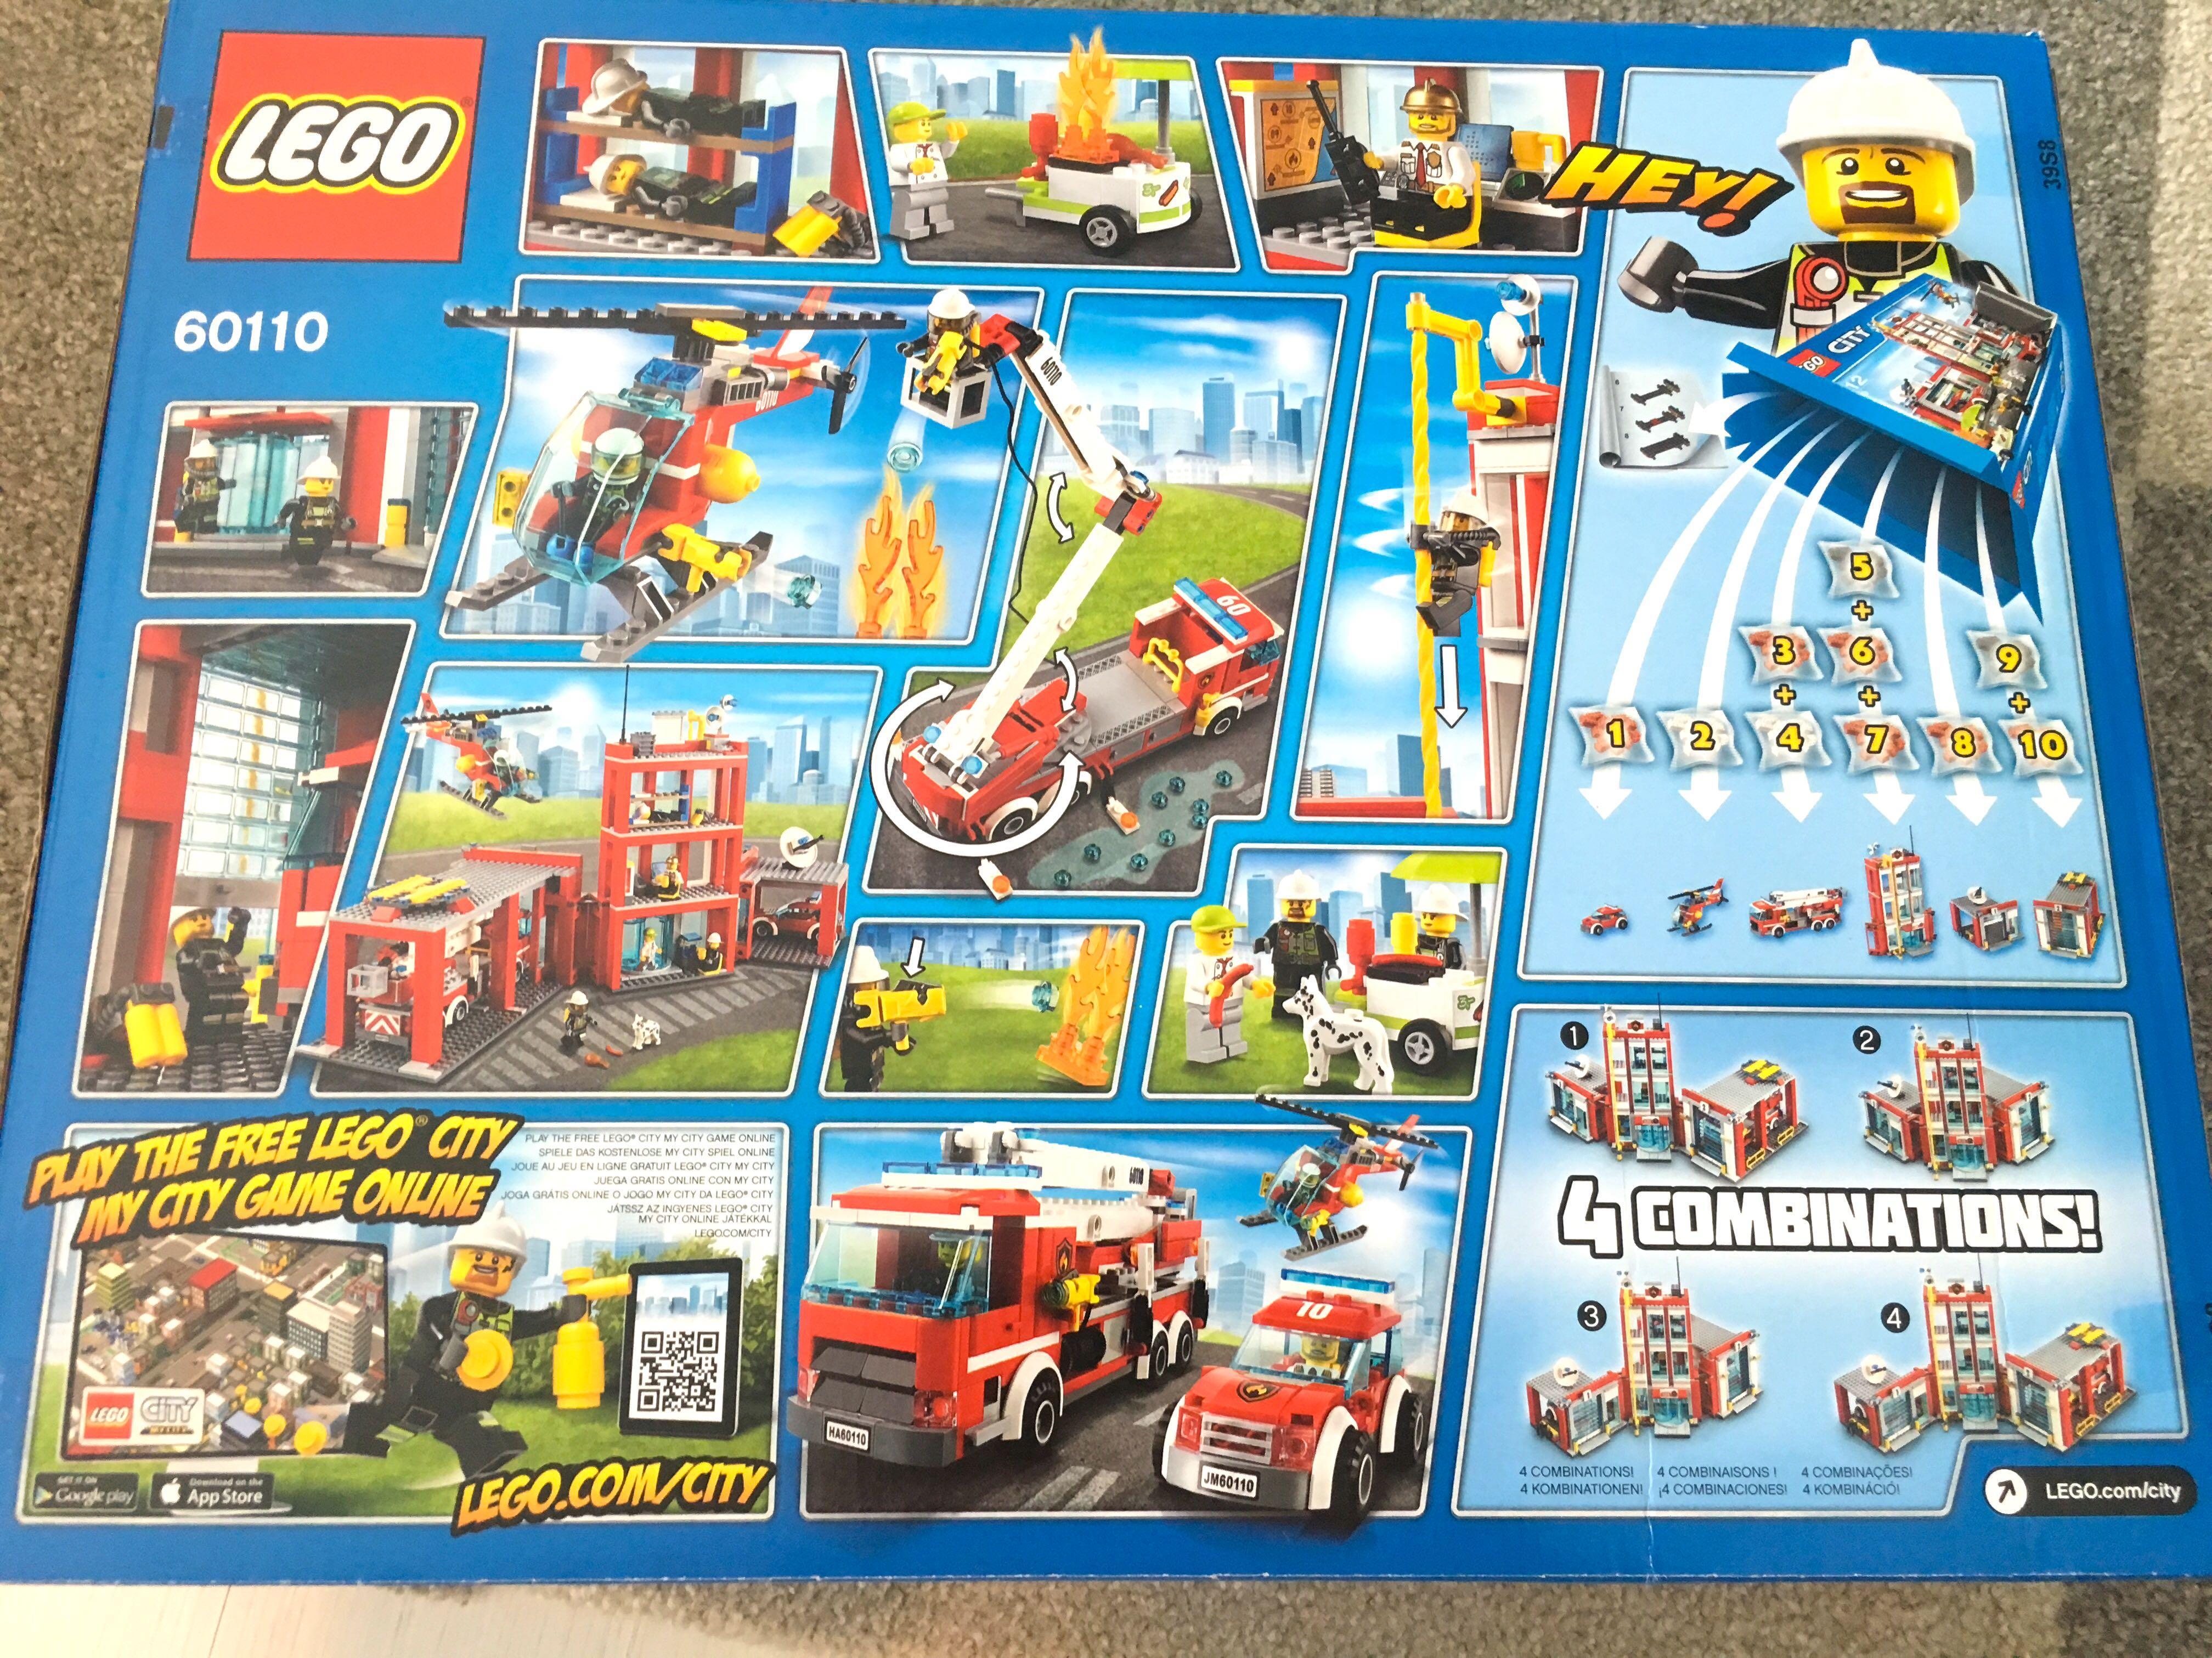 Lego City Set 60110 Fire Station (2019), Toys & Games